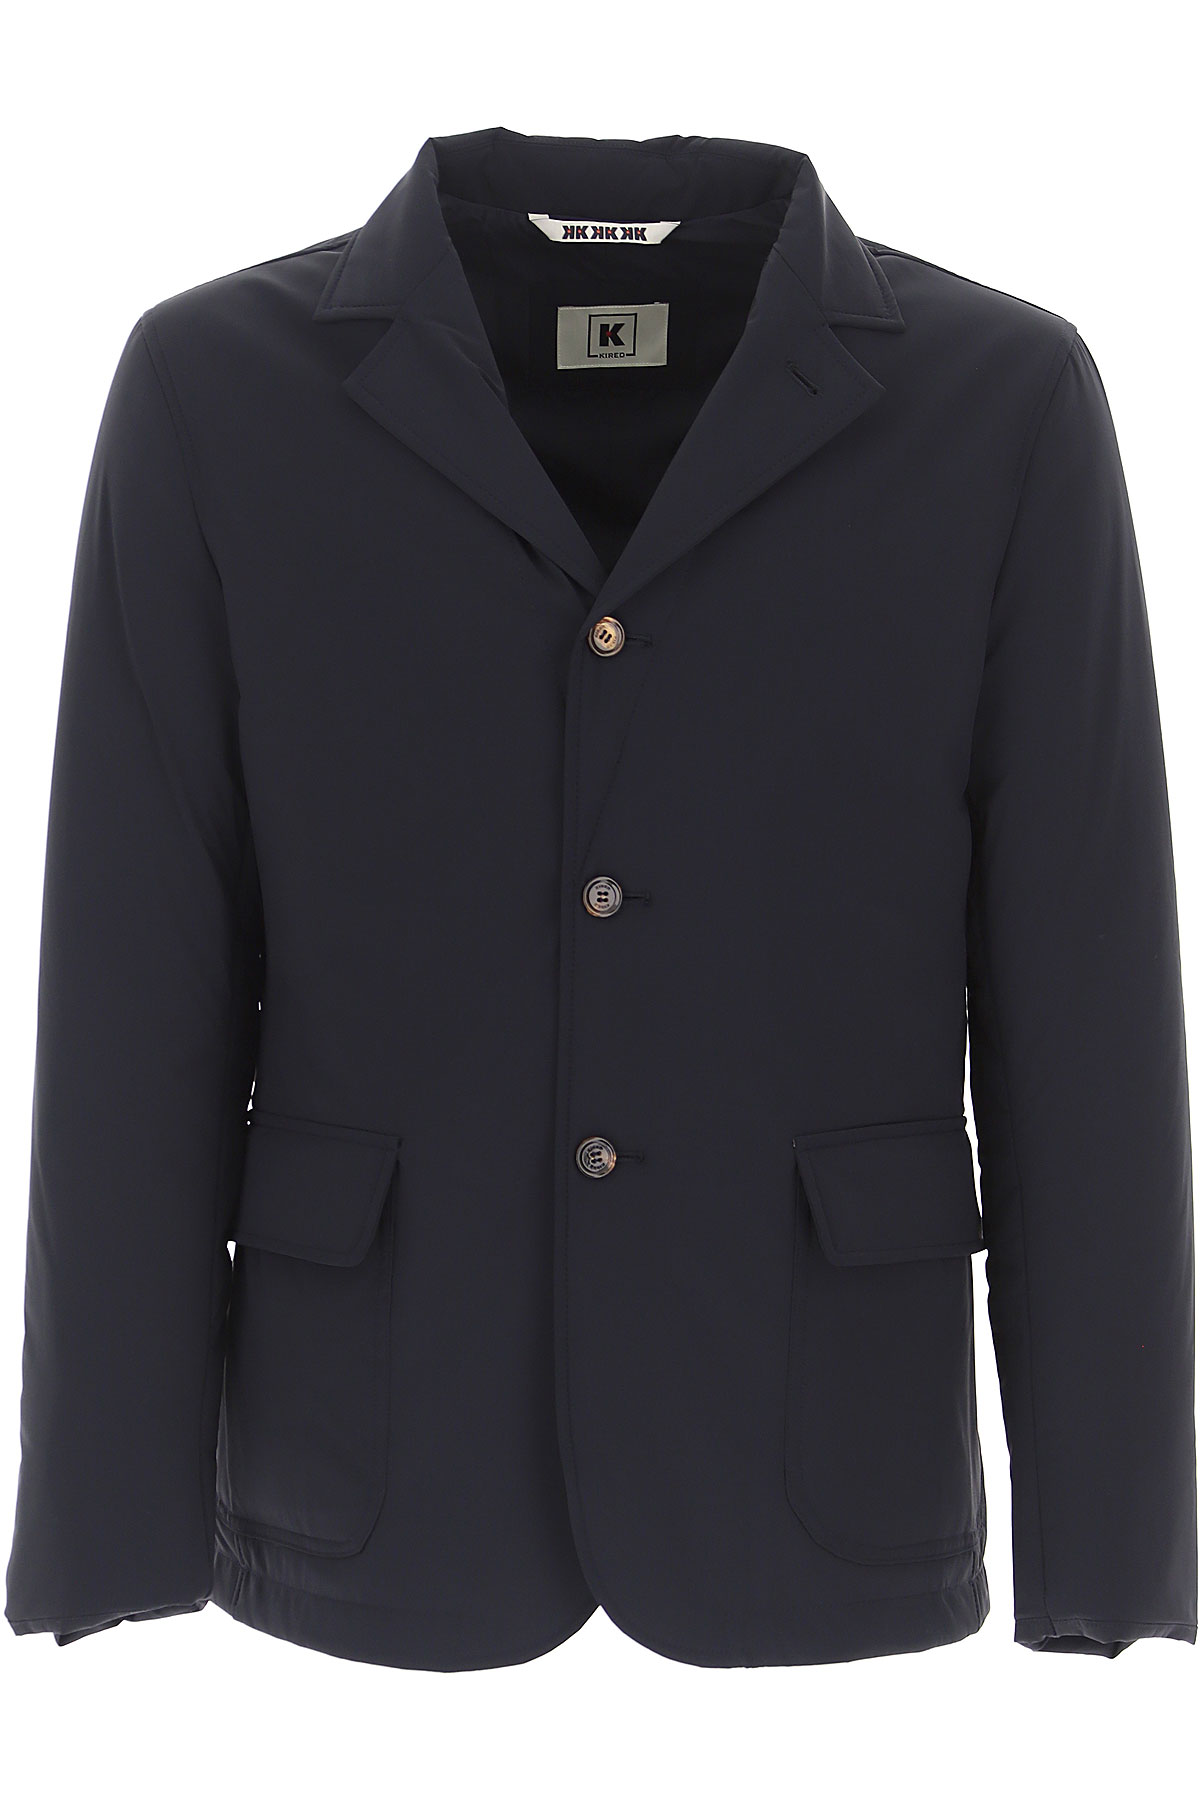 Kired Down Jacket for Men, Puffer Ski Jacket On Sale, navy, polyamide, 2019, L M XL